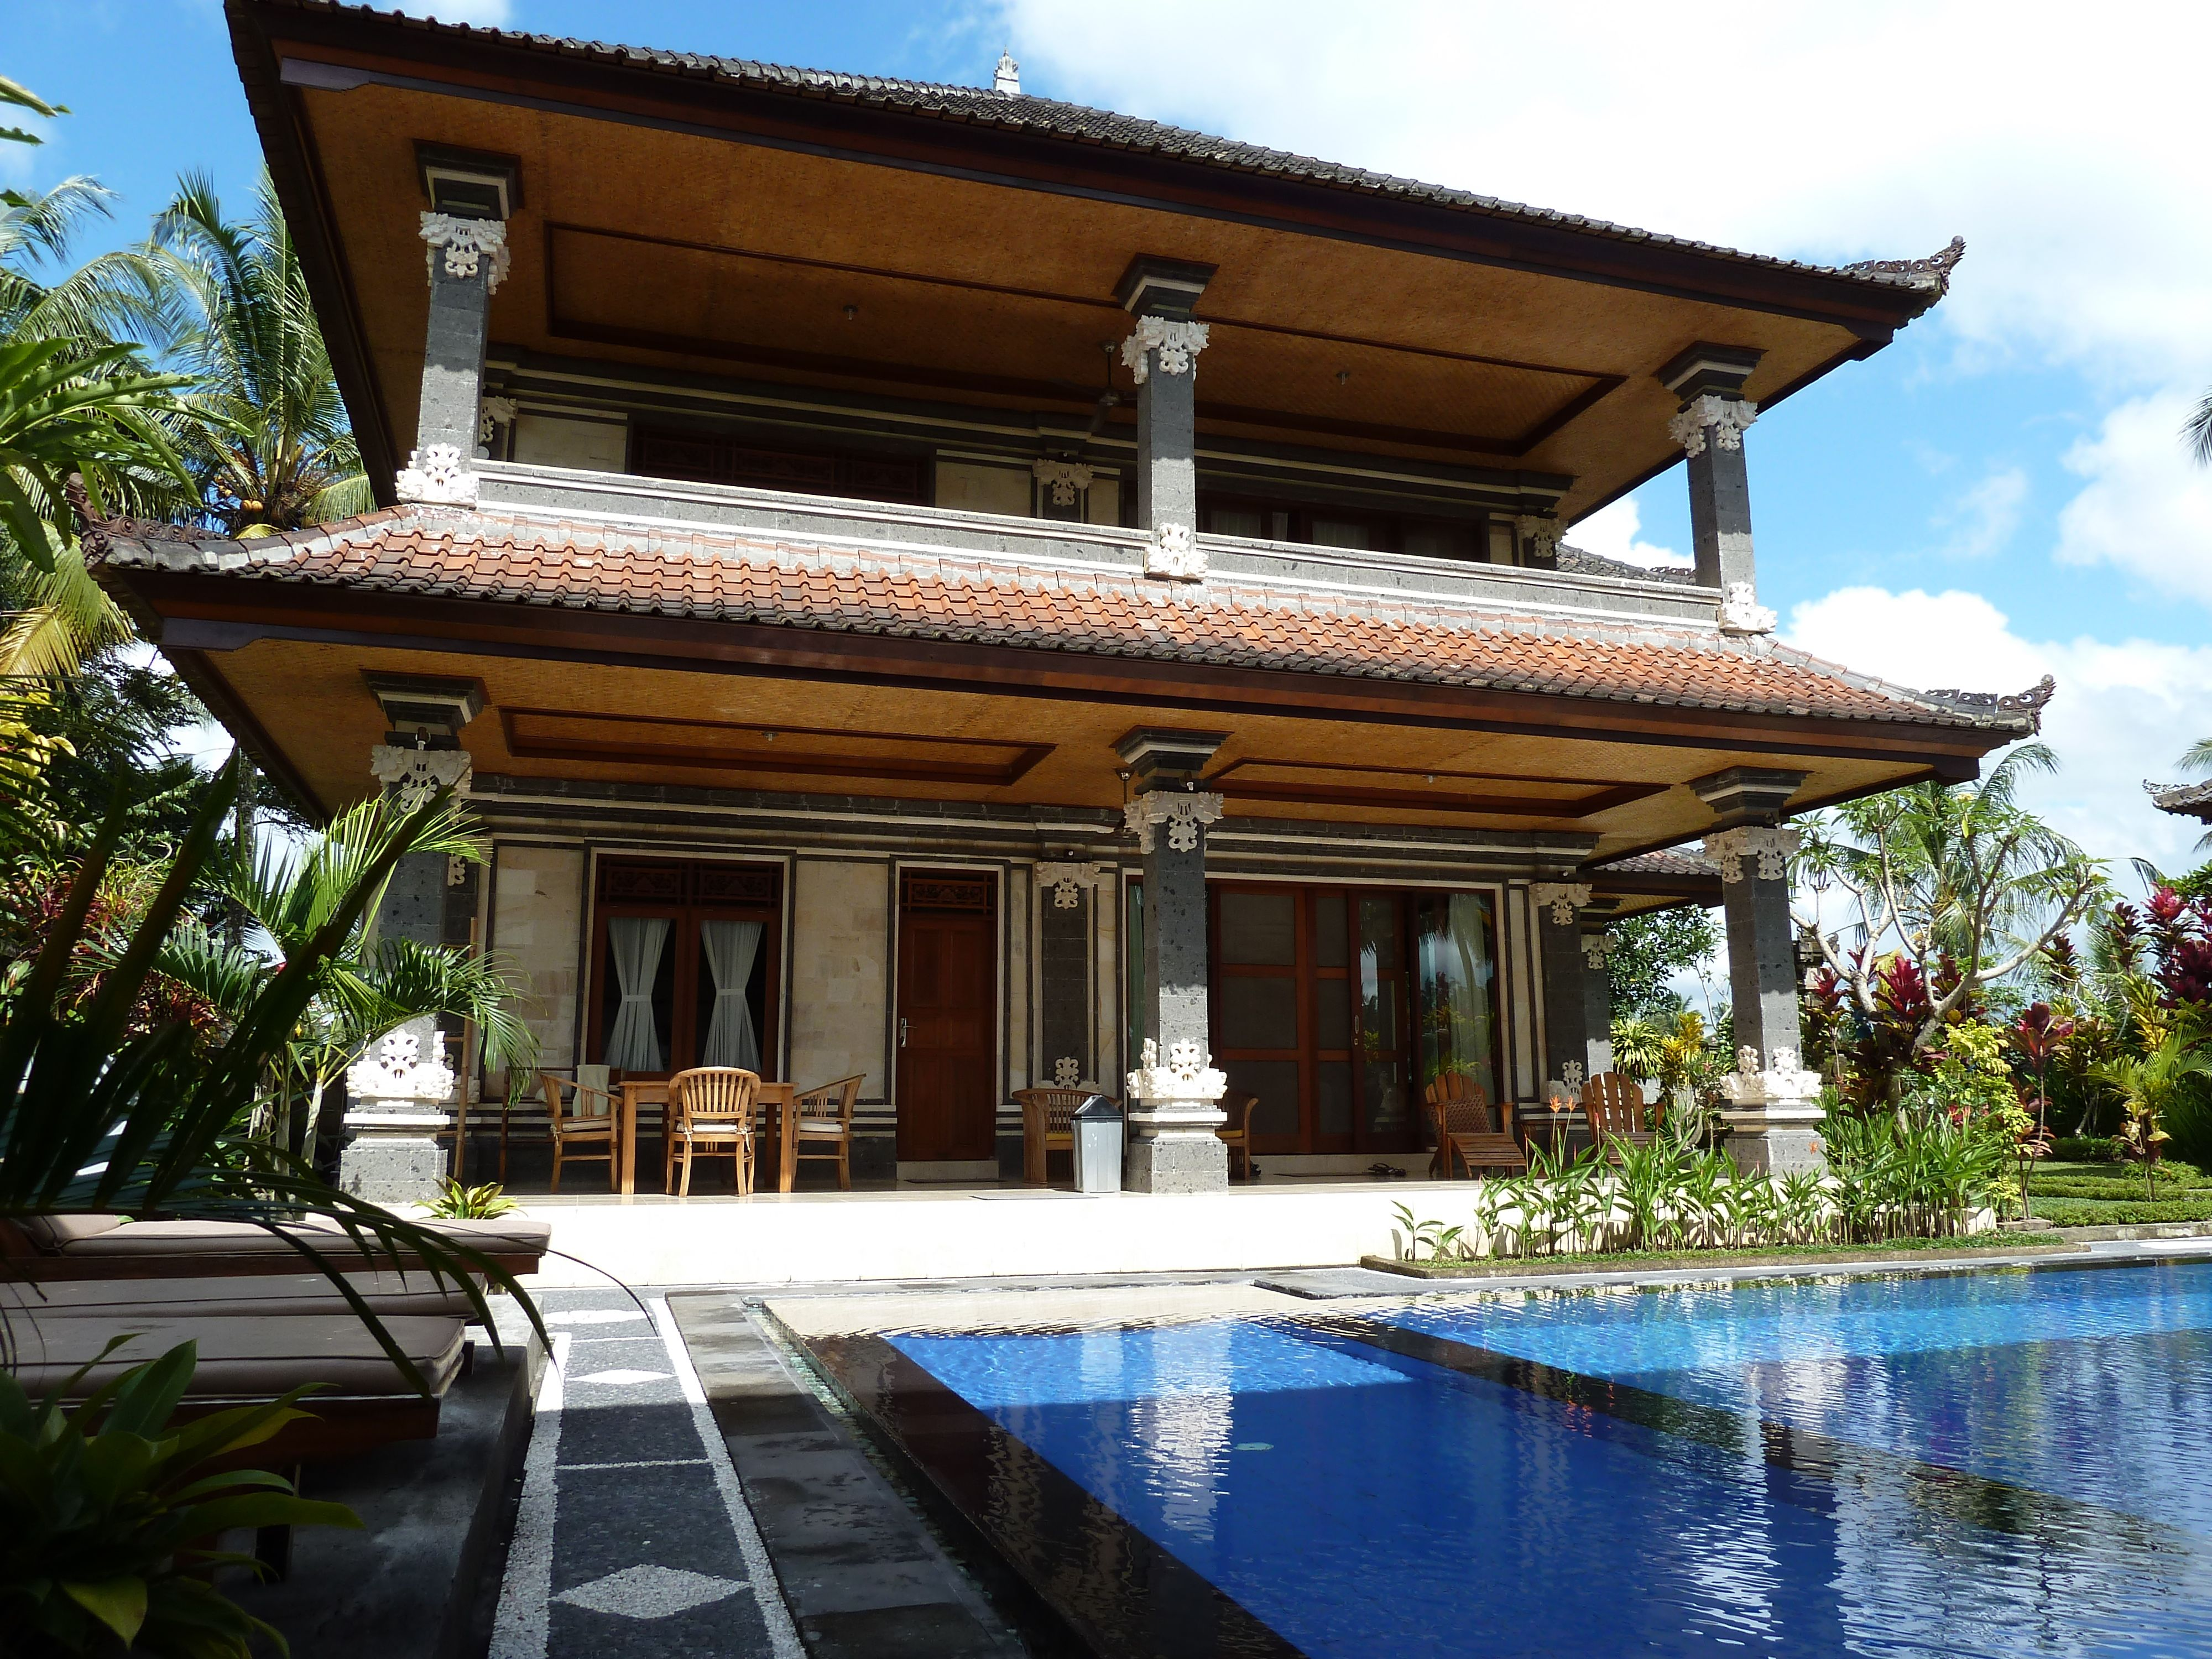 The Villa at Ubud